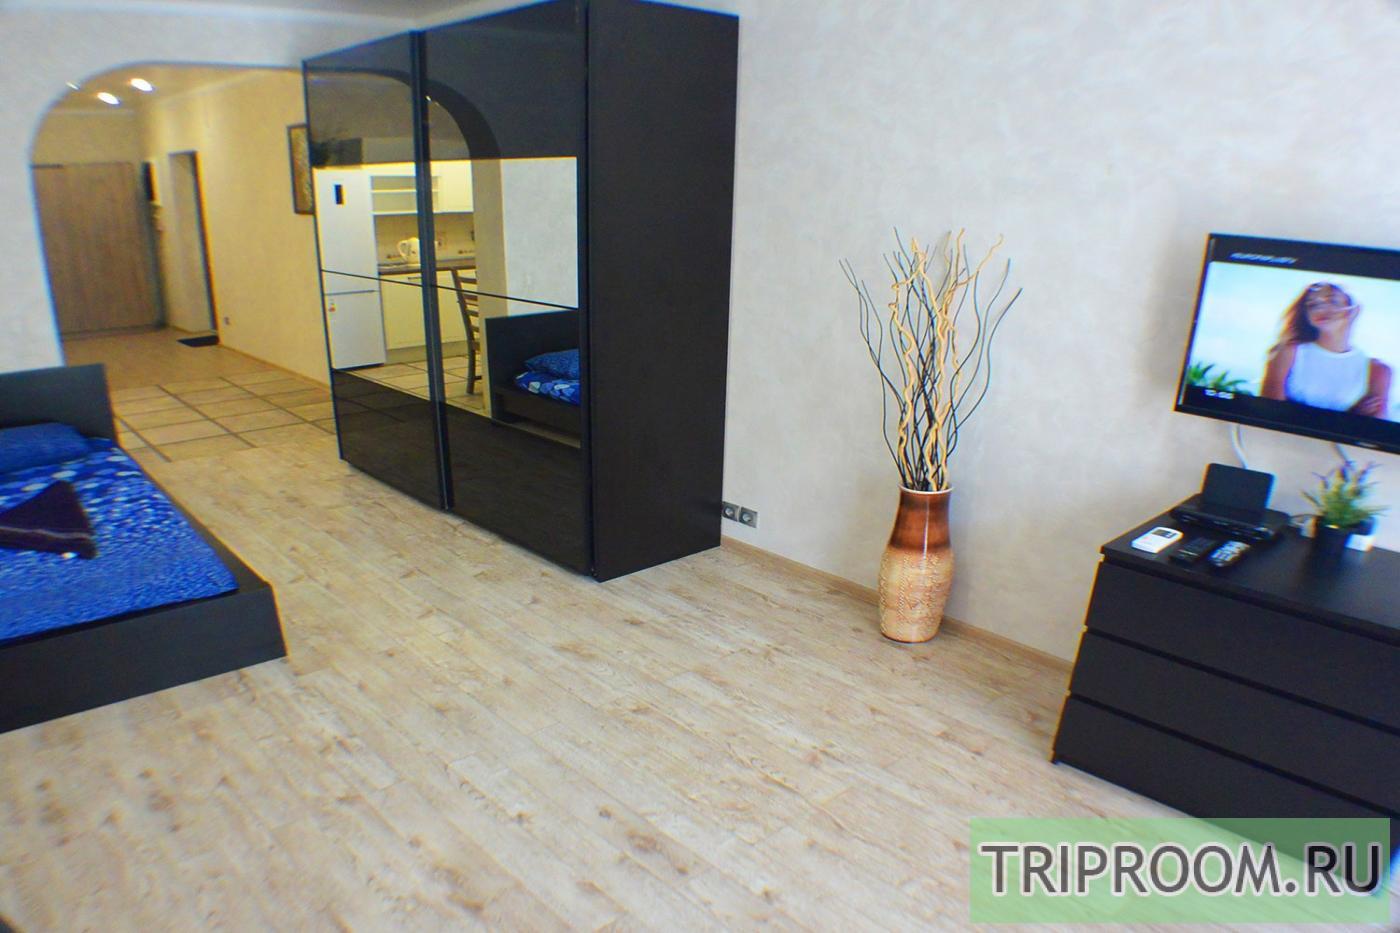 1-комнатная квартира посуточно (вариант № 26990), ул. Кирпичная улица, фото № 6